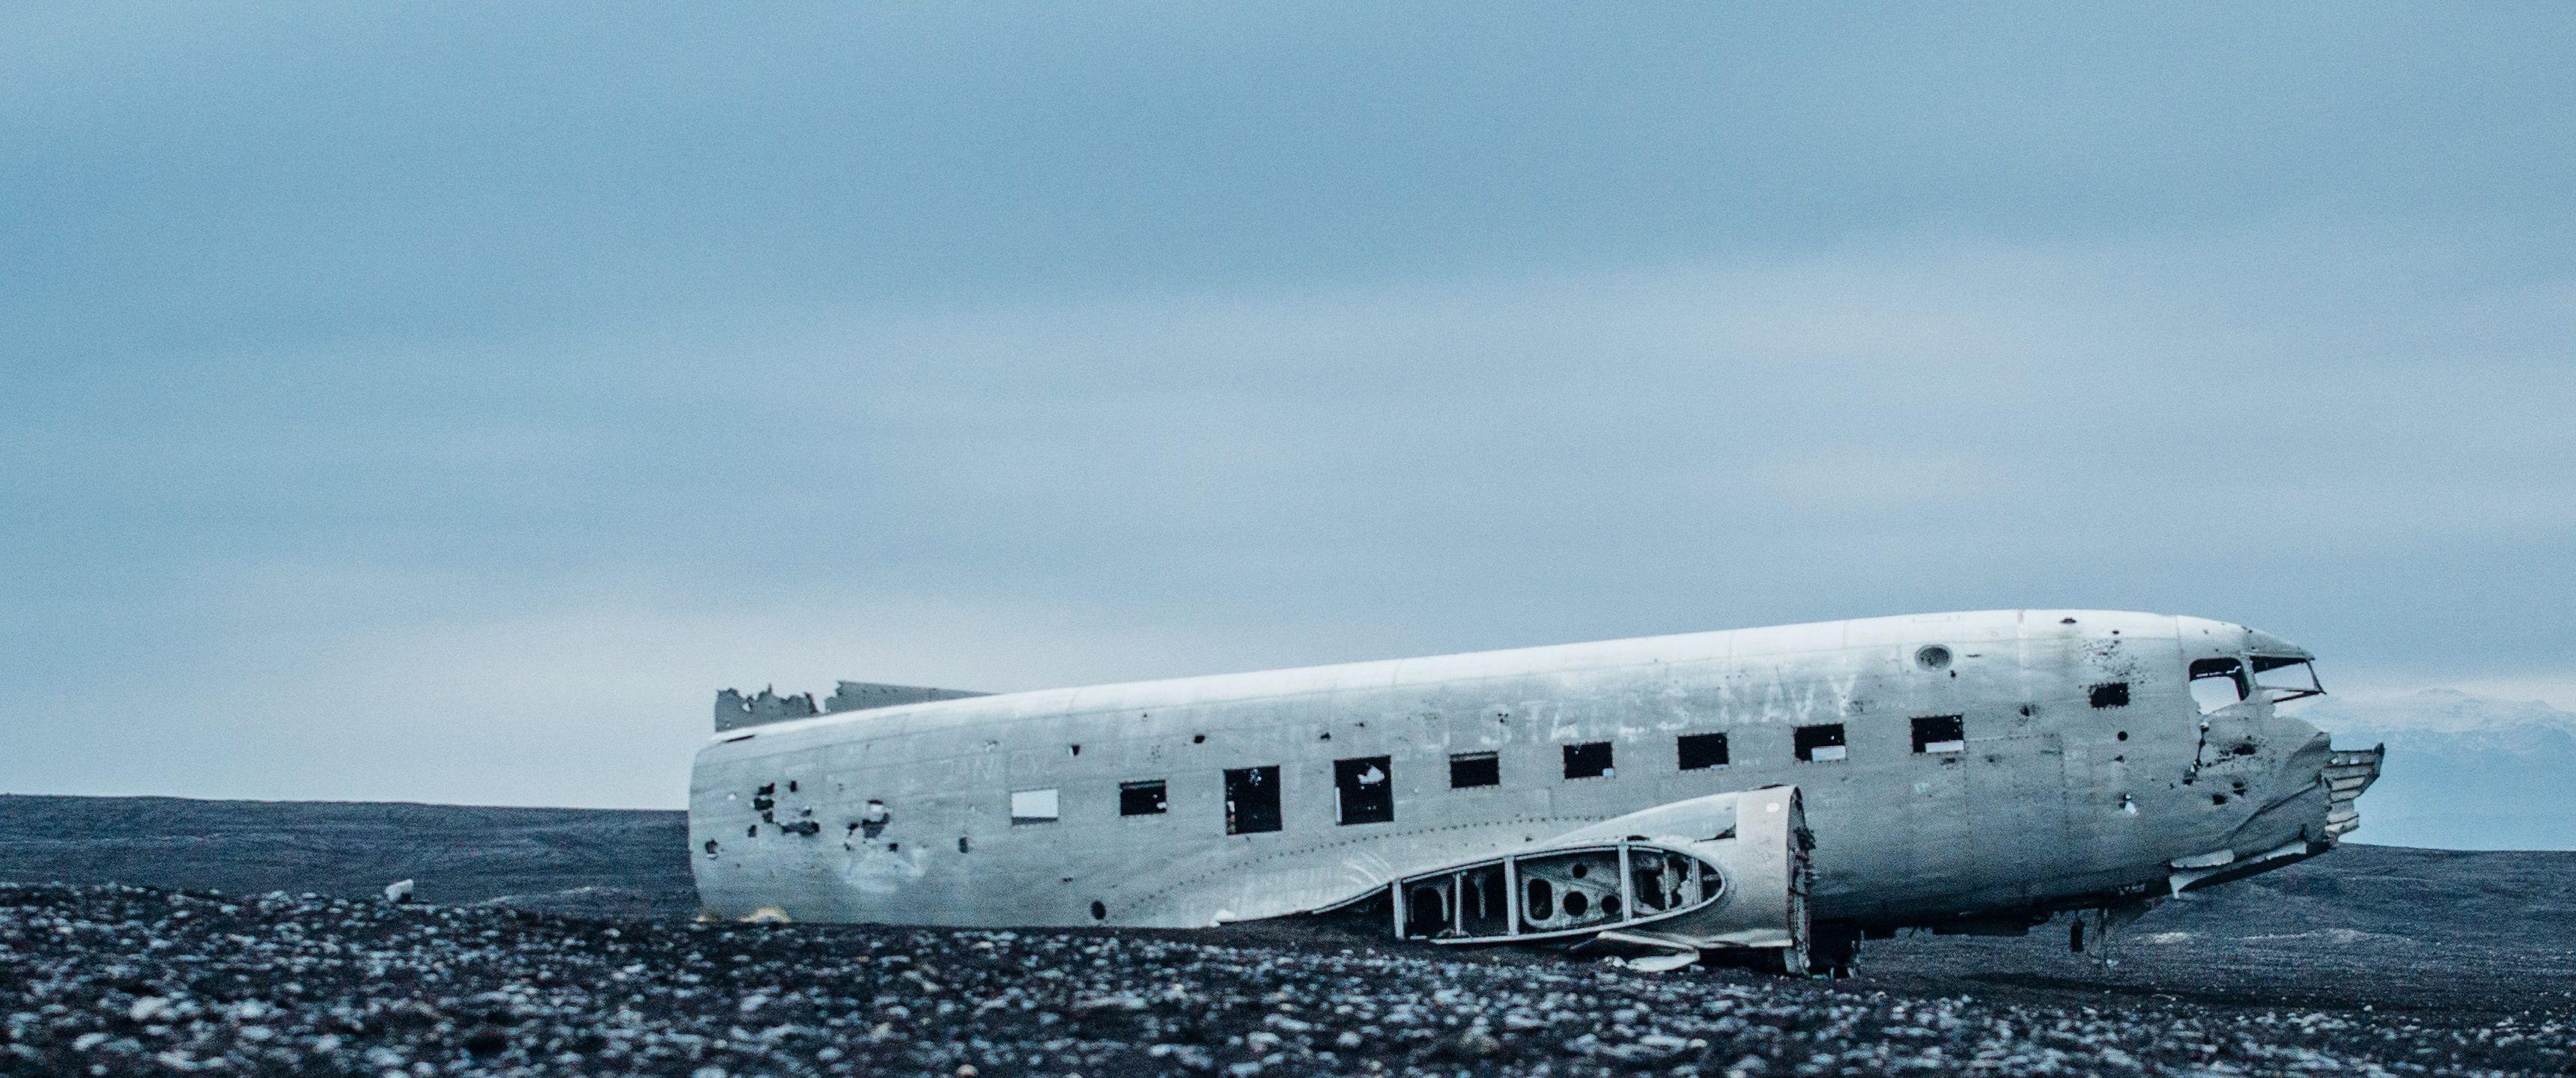 Abandoned Flight 21 9 Ultrawide Hd Wallpaper 3440x1440